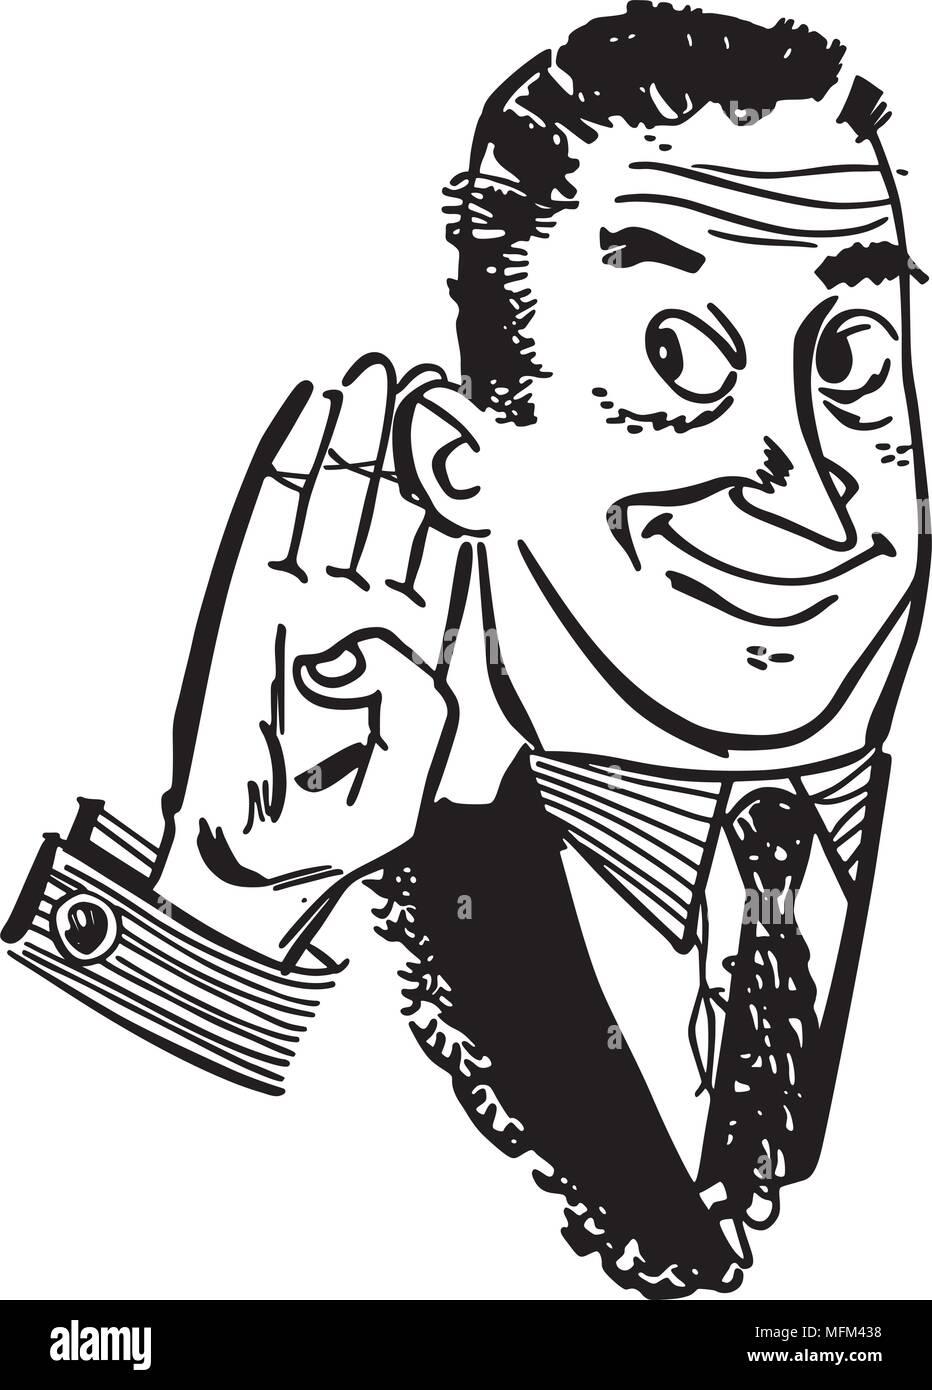 Man Cupping Ear - Retro Clipart Illustration - Stock Image